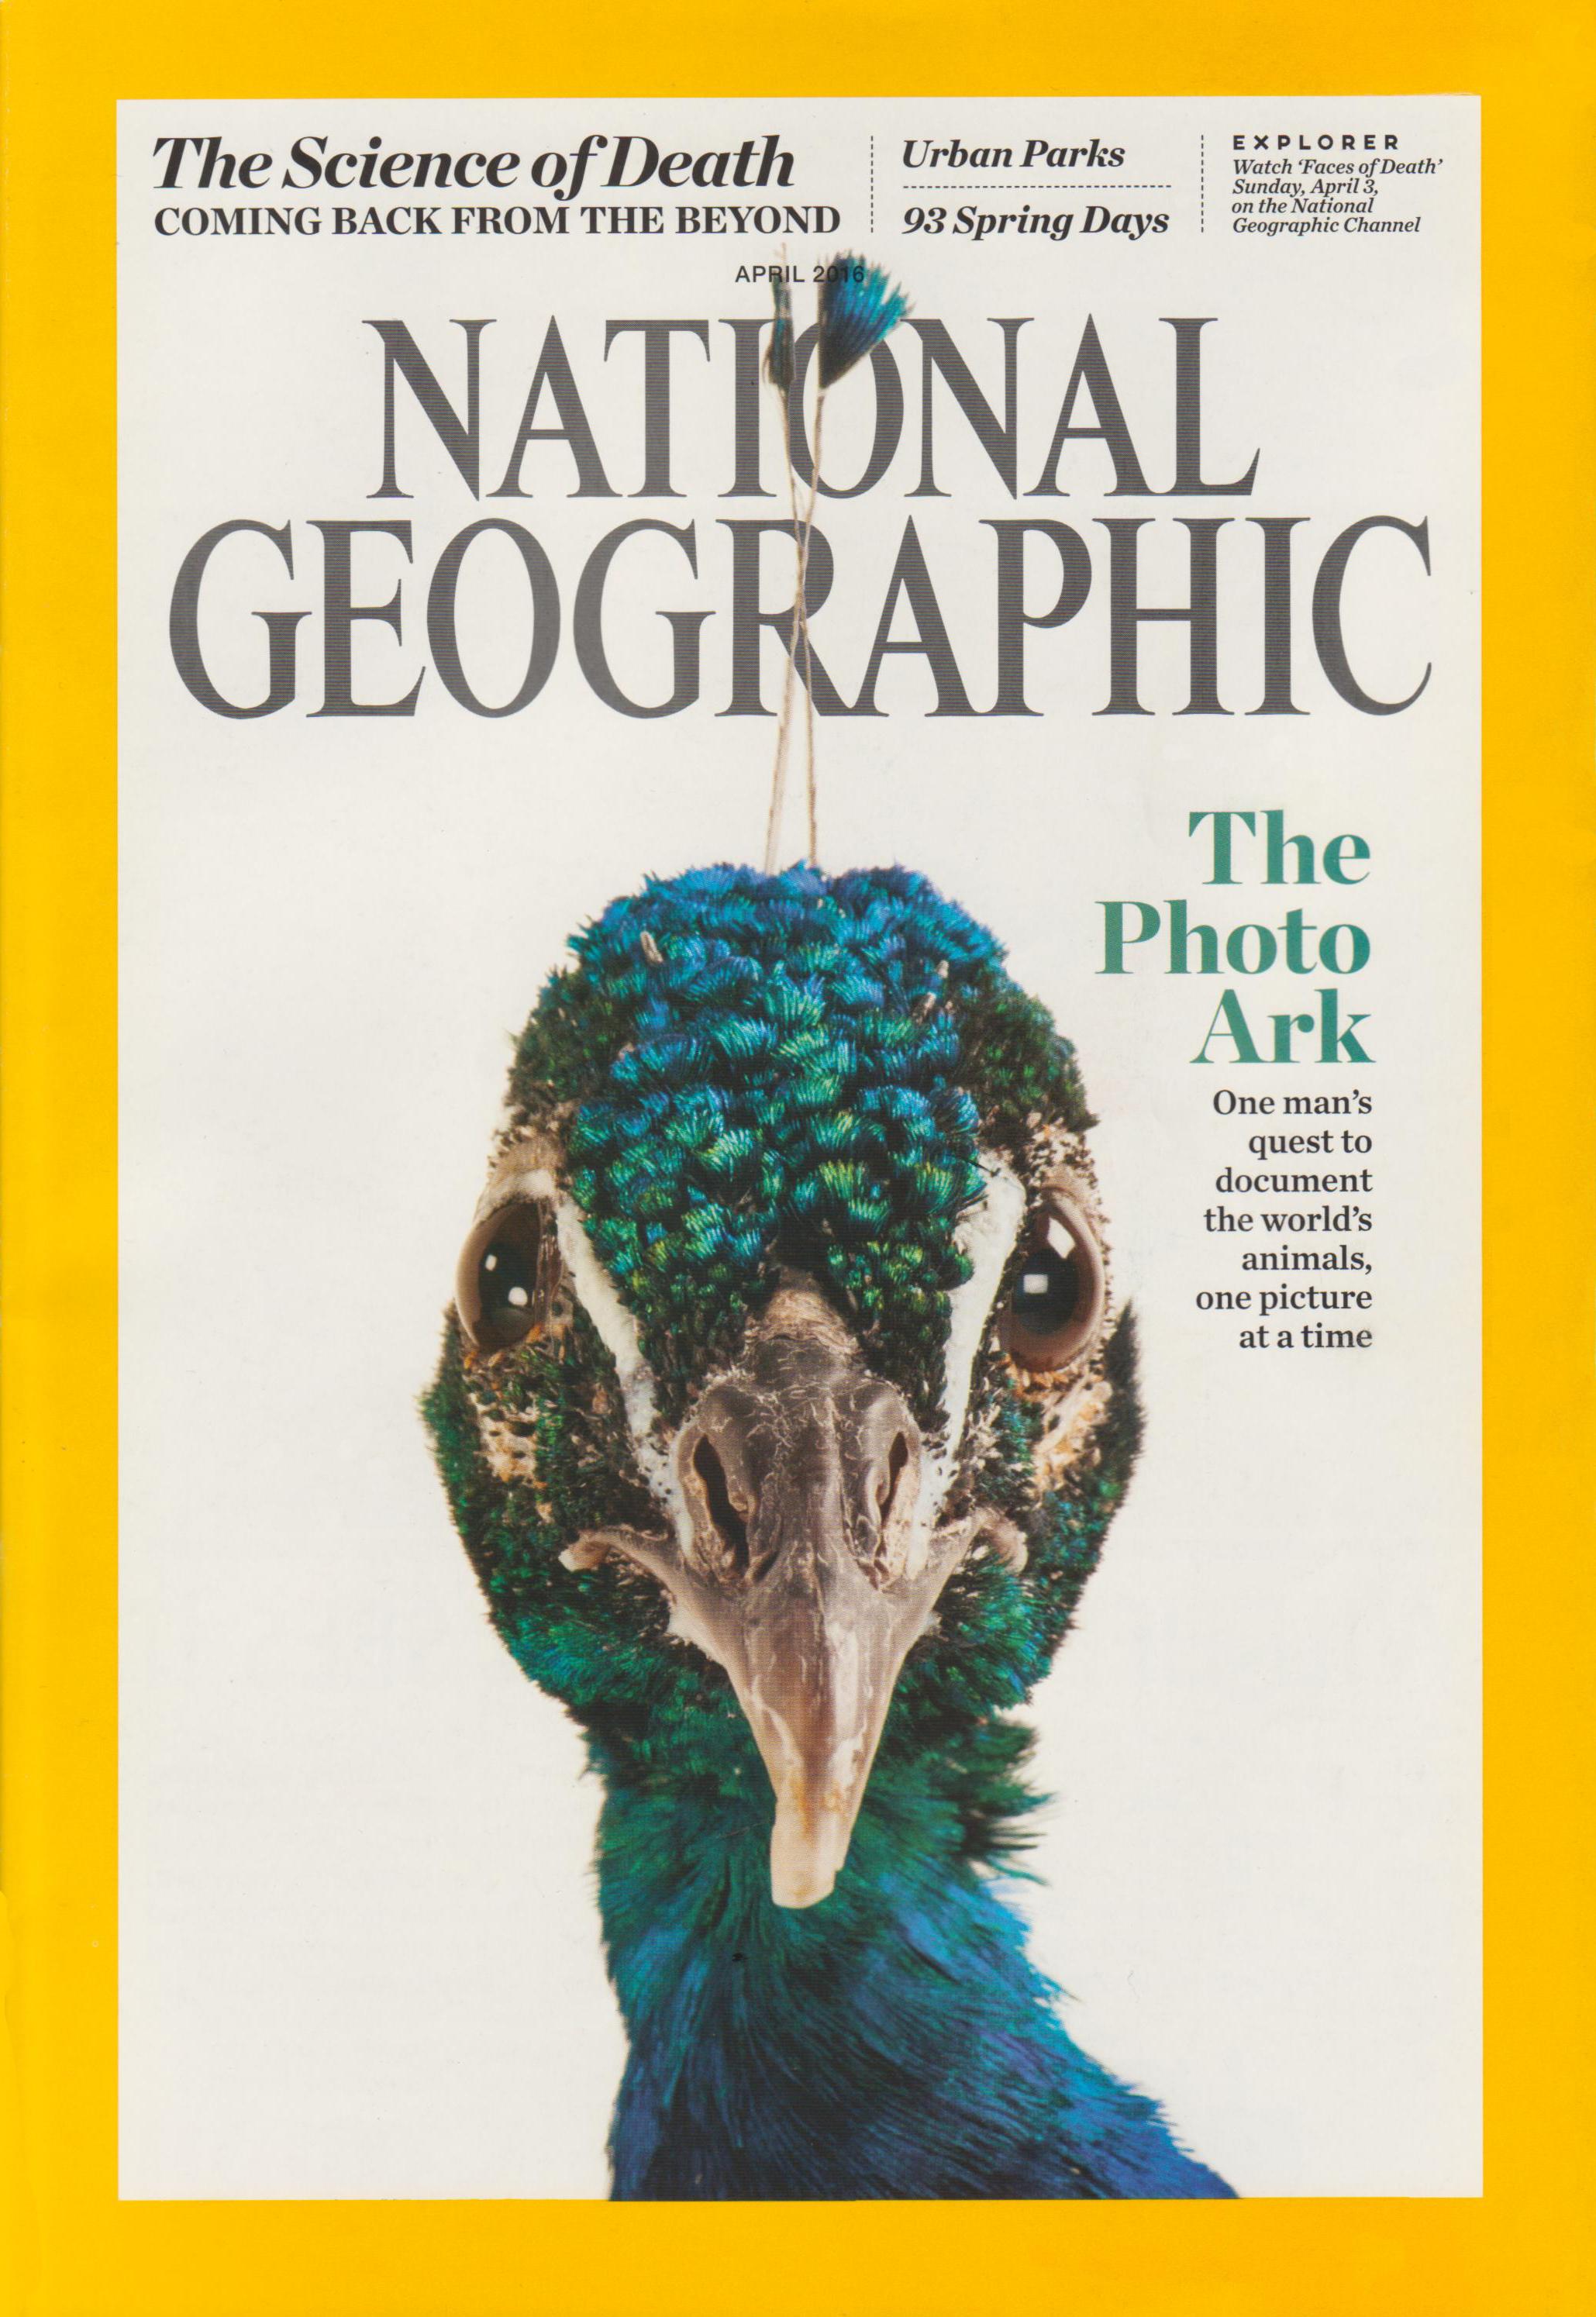 NatGea Cover 2016